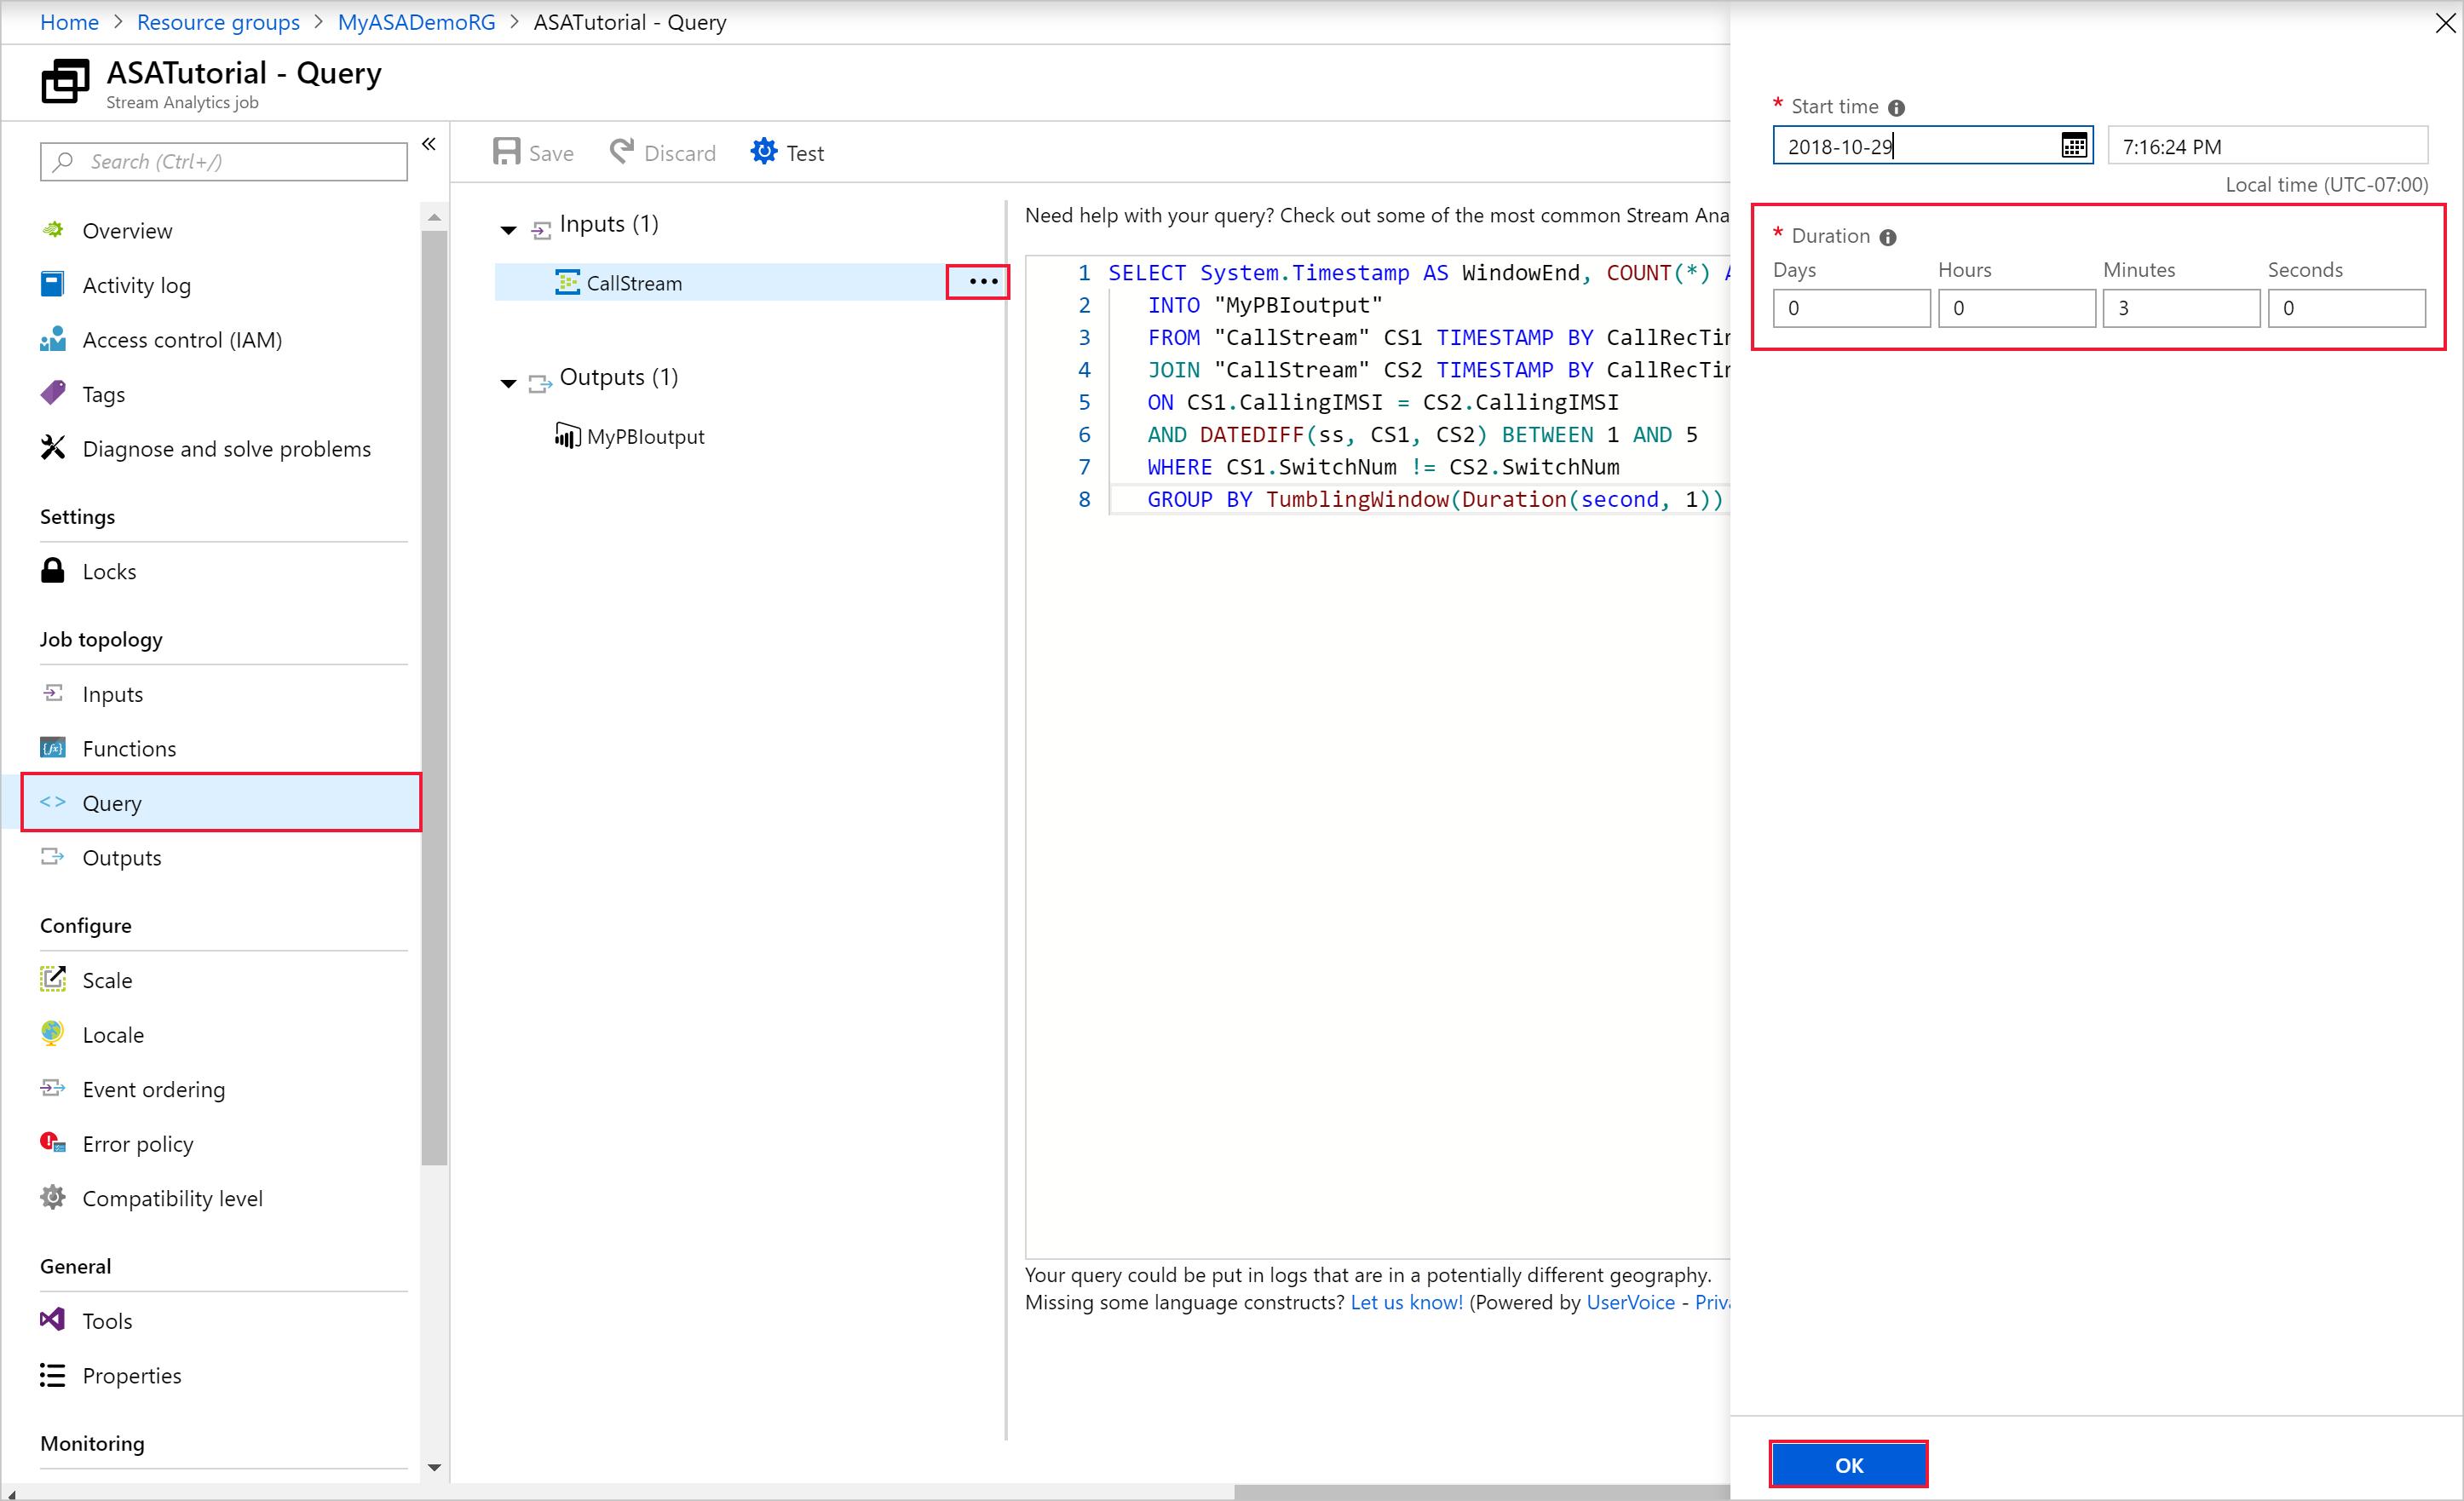 Tutorial: Create and manage a Stream Analytics job using